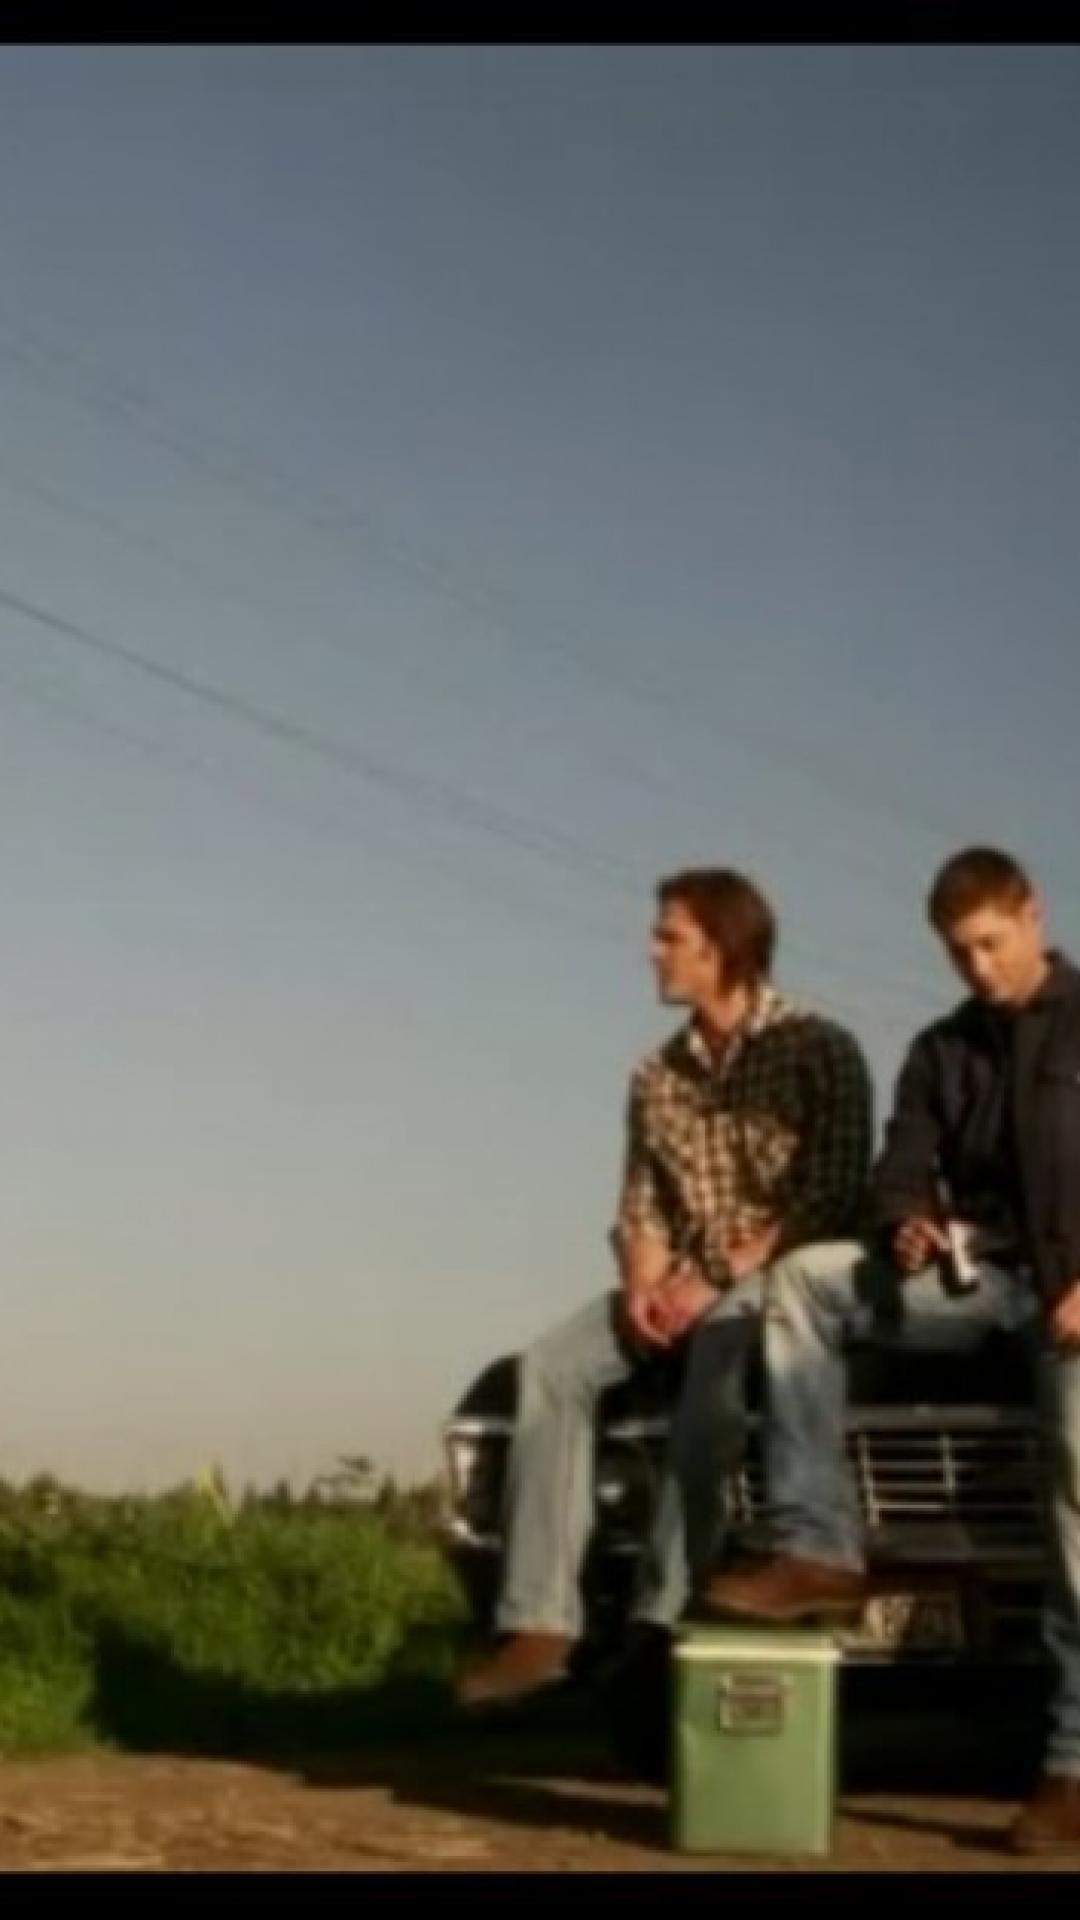 Winchester sam impala supernatural (tv series) 67 wallpaper   (60448)